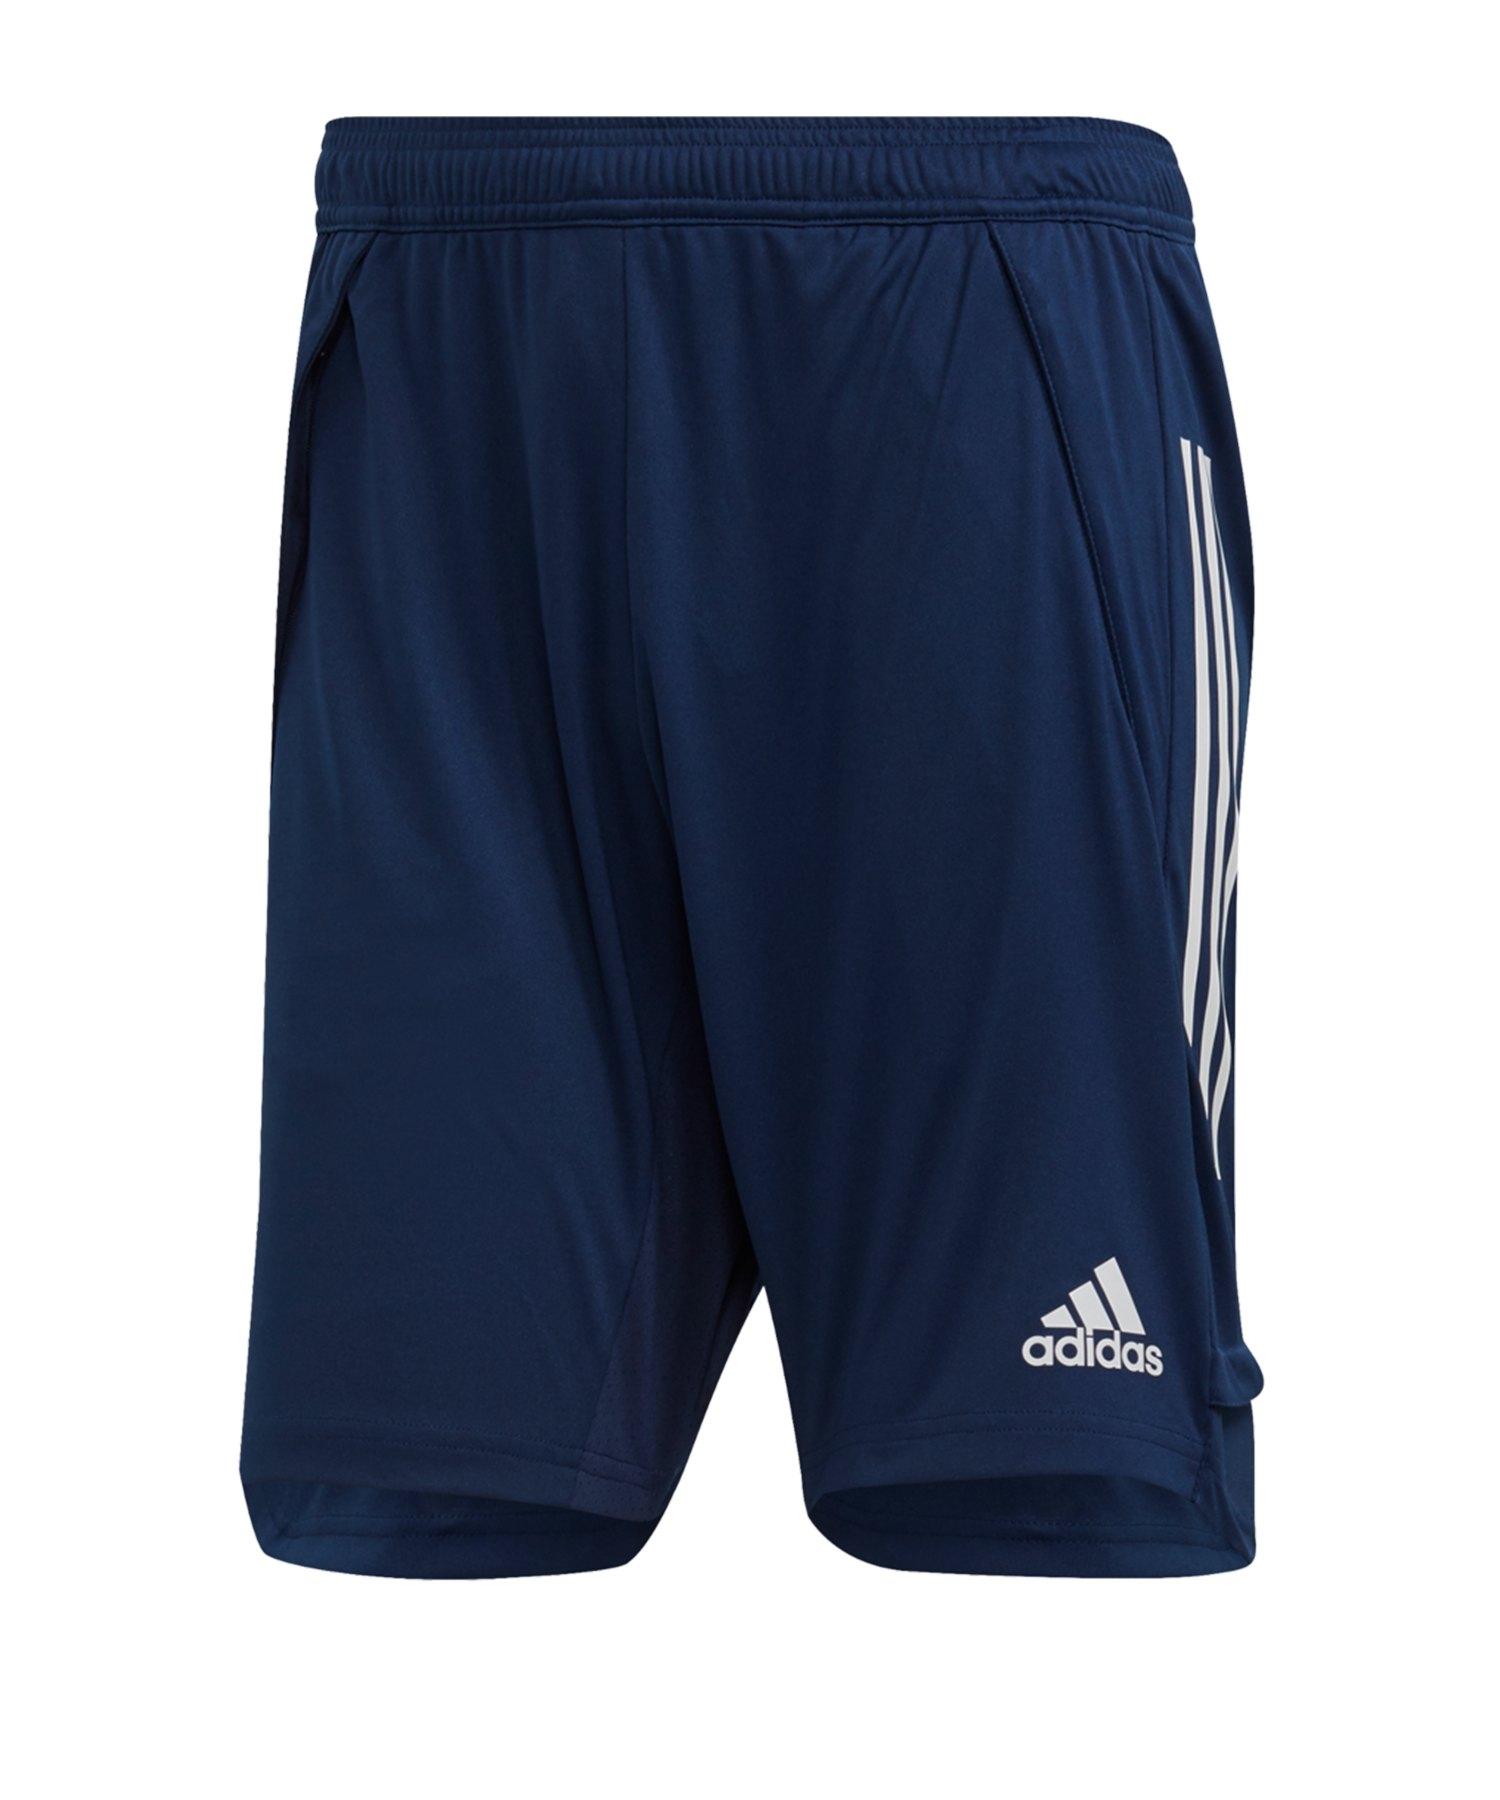 adidas Condivo 20 Trainingsshort Dunkelblau Weiss - blau